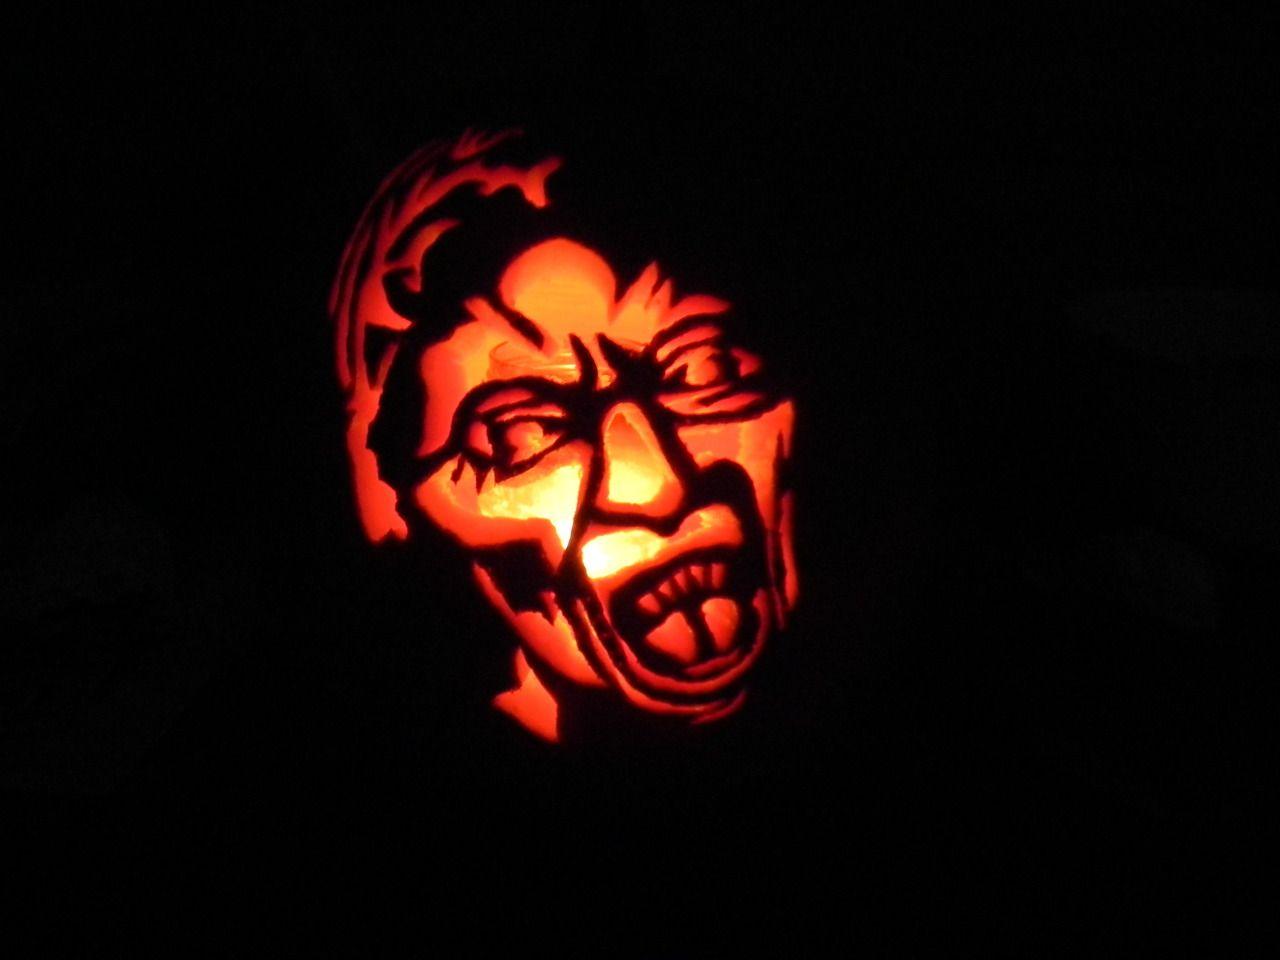 Doctor Who Exploding Tardis Pumpkin Carving On Global Geek